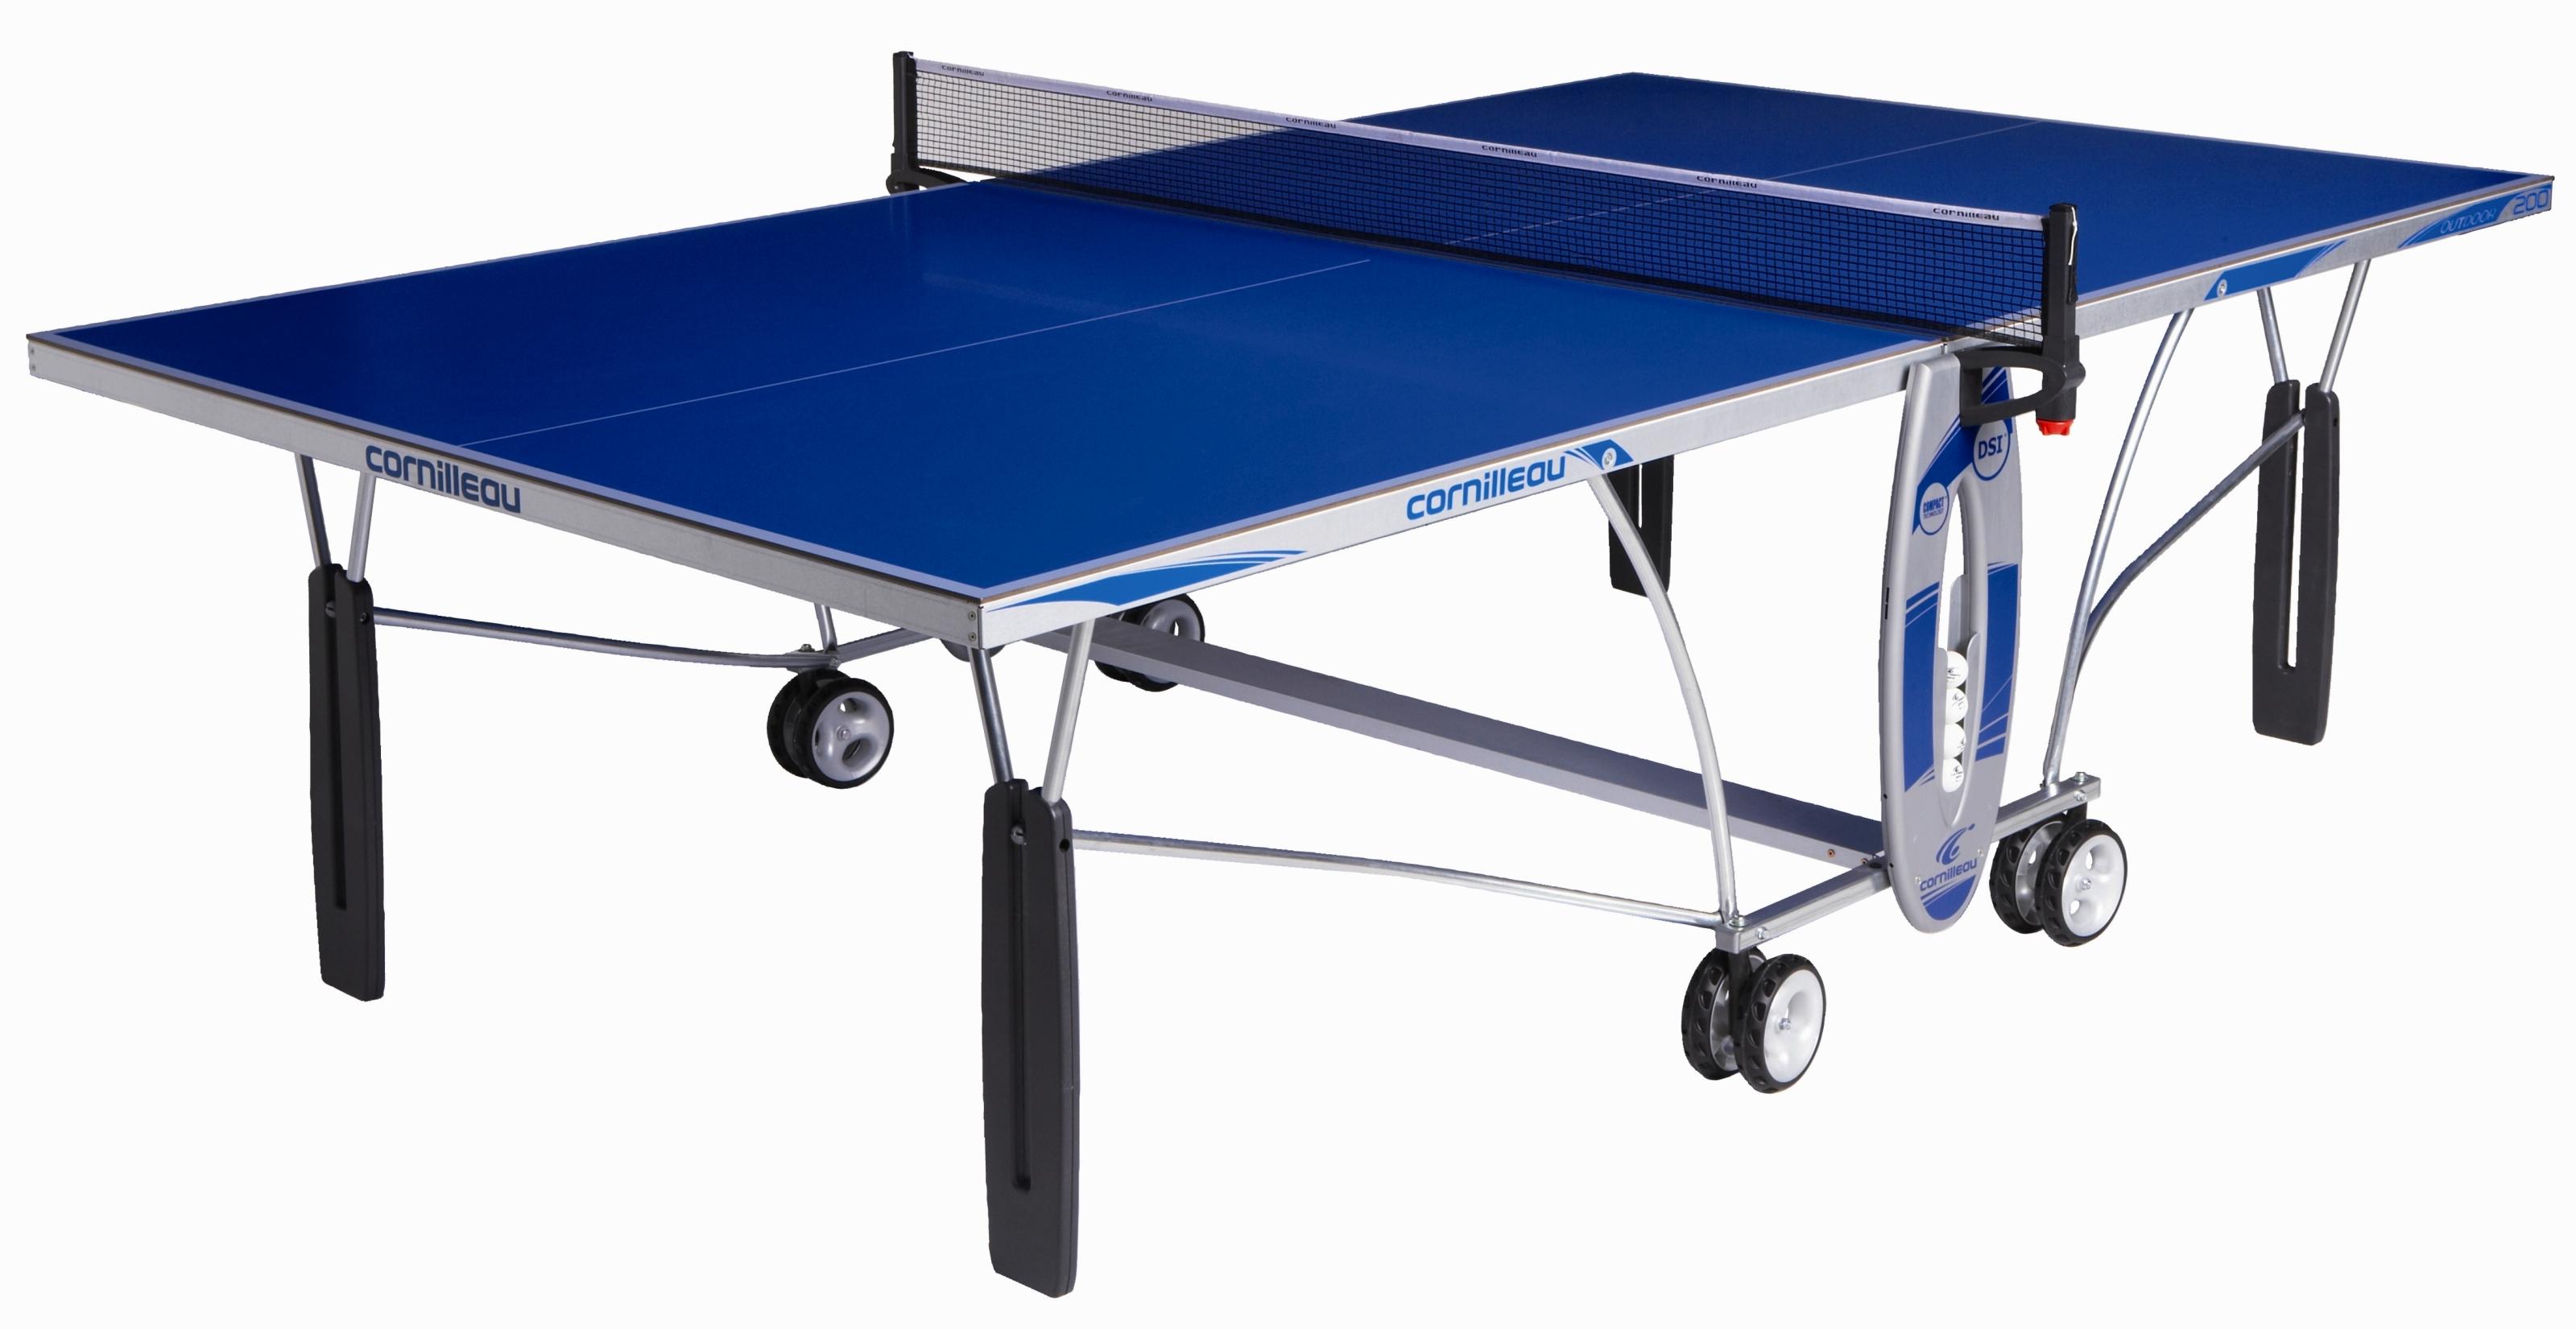 cornilleau sport 200 s outdoor. Black Bedroom Furniture Sets. Home Design Ideas